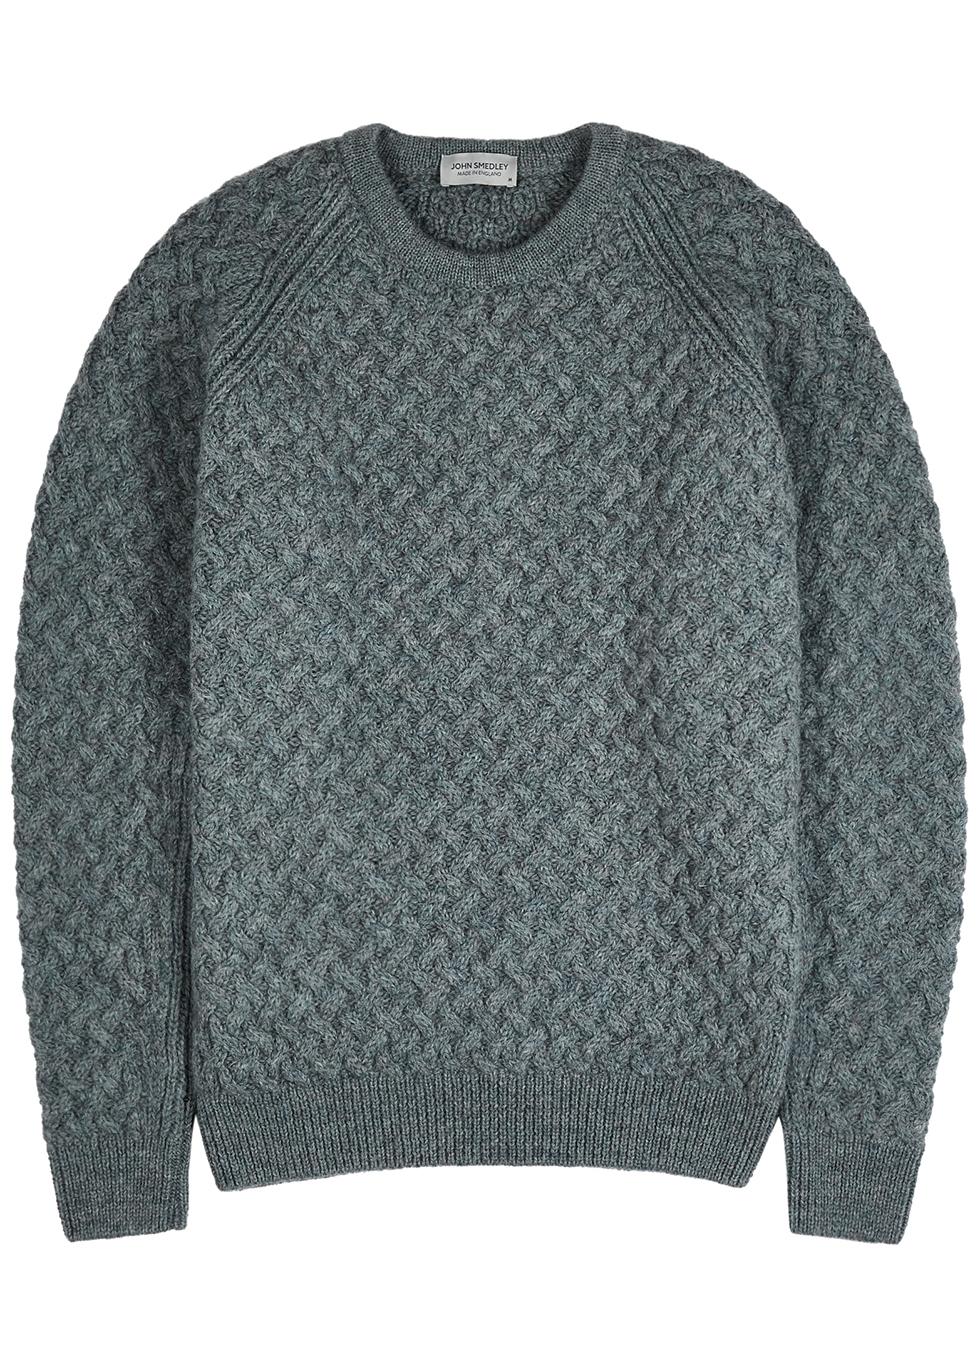 Hillside blue cable-knit wool jumper